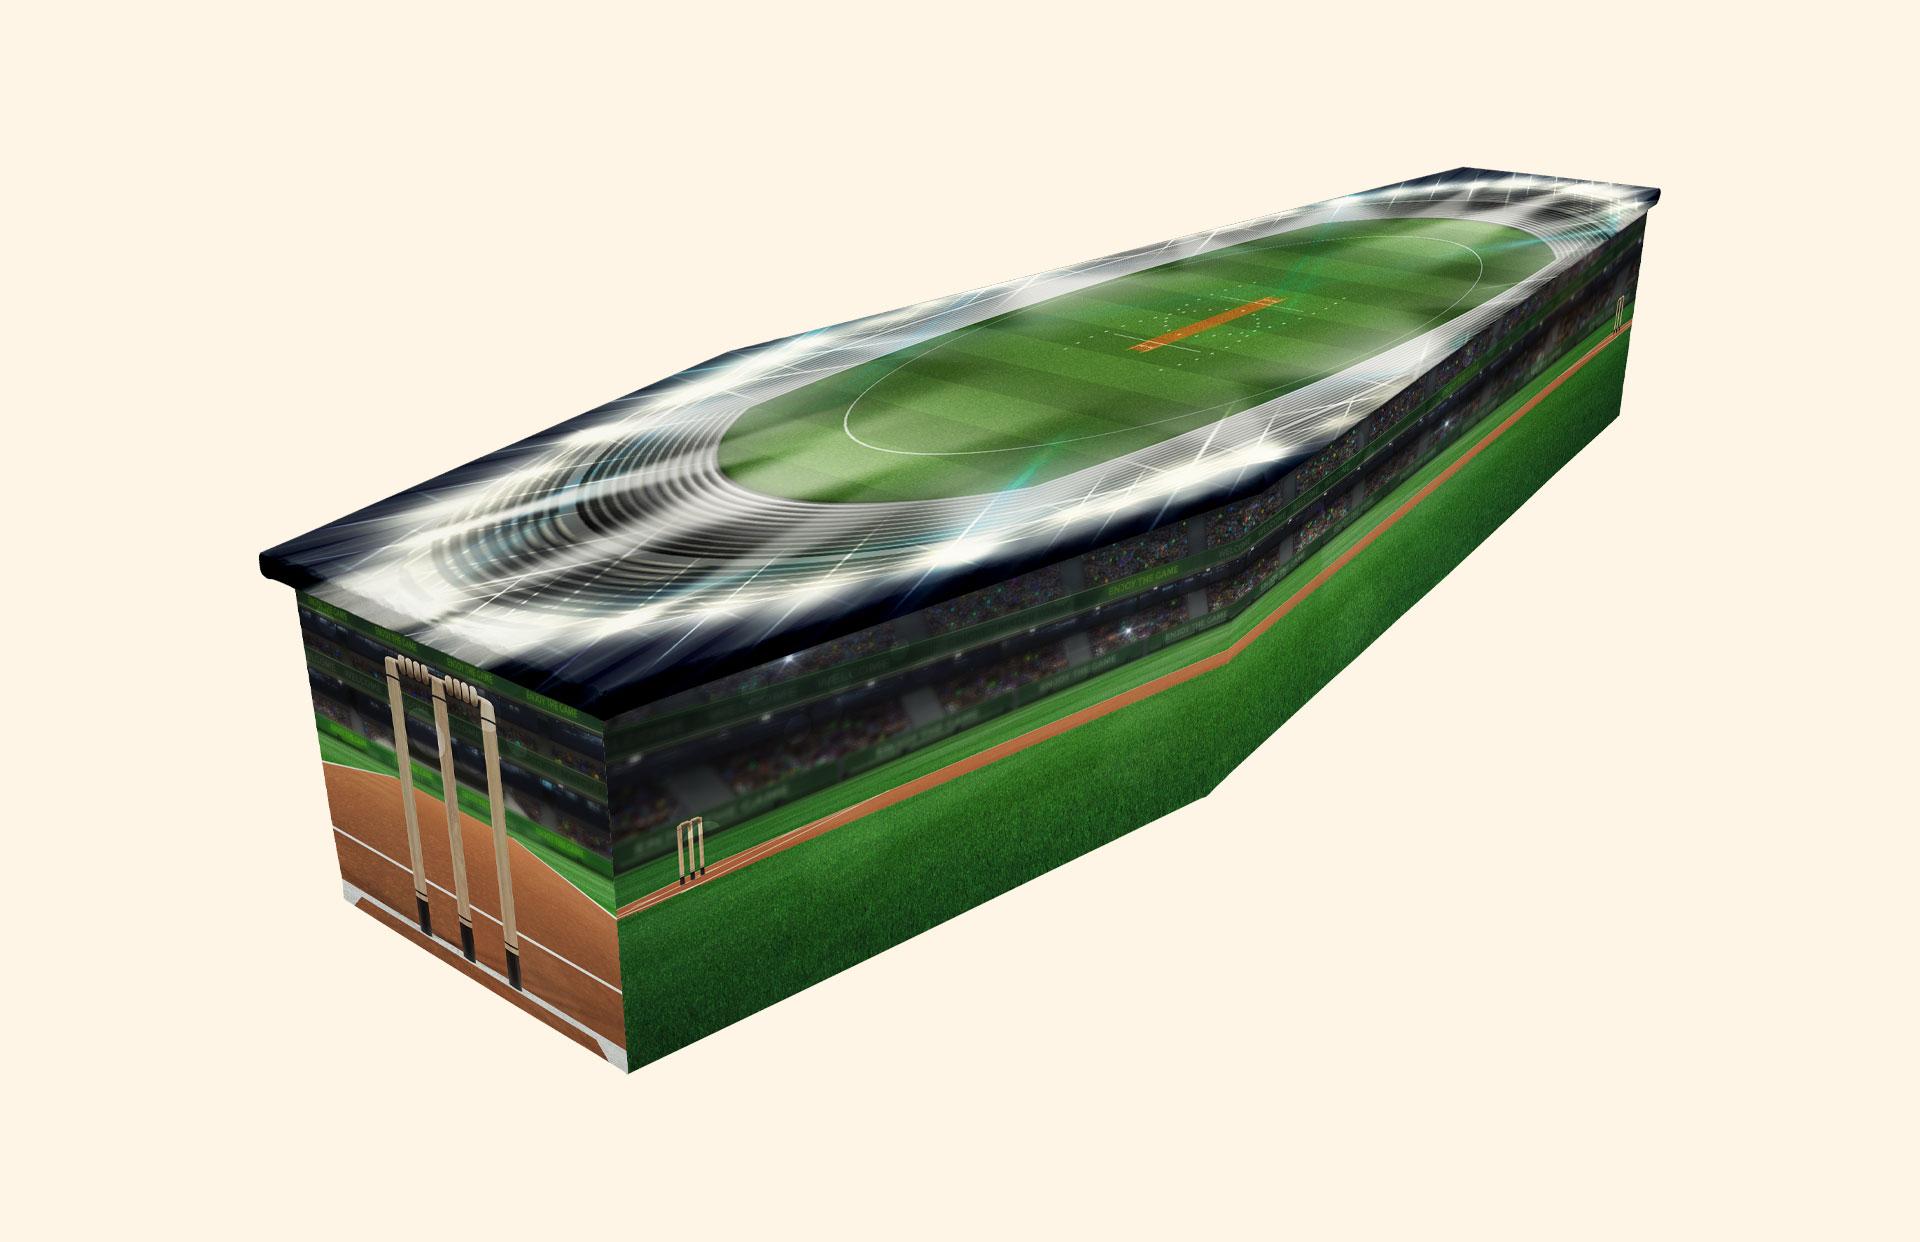 Howzat! Cardboard coffin